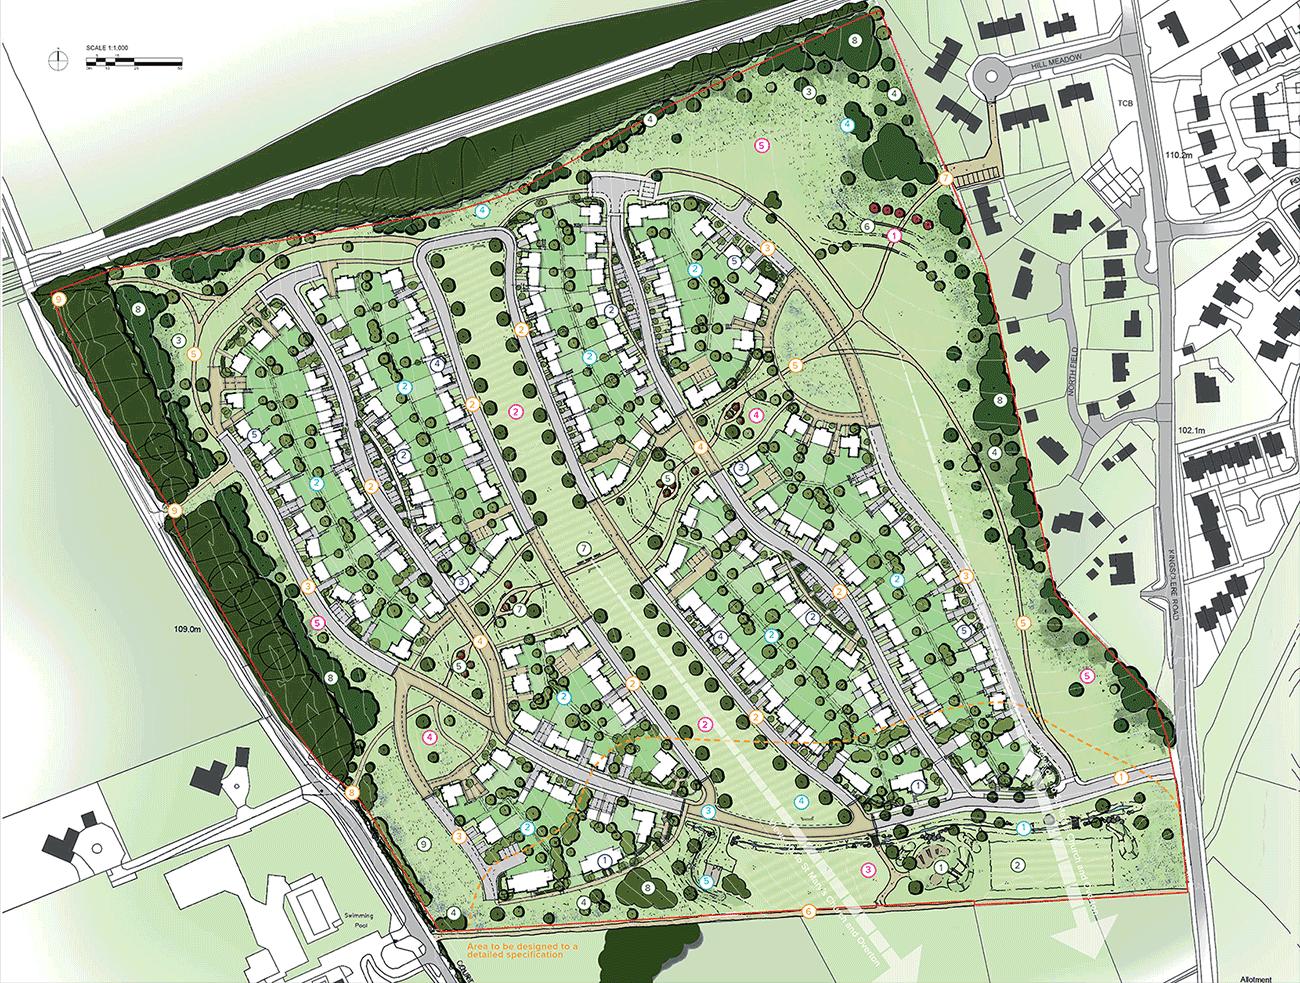 Overton - Dandara Strategic Land Project